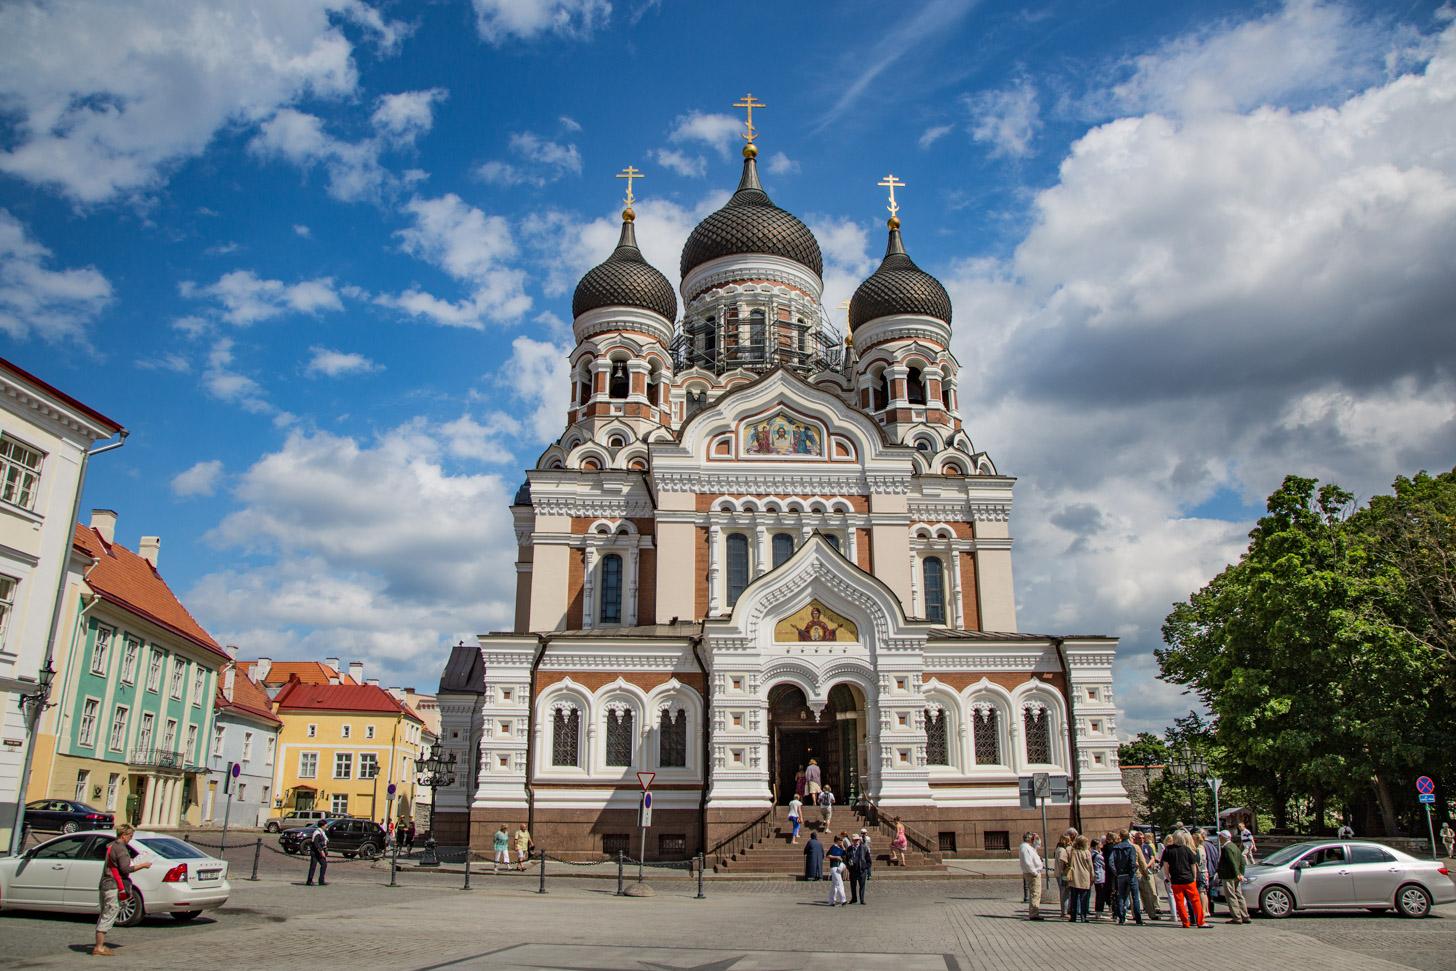 De Alexander Nevski-kathedraal in Tallinn